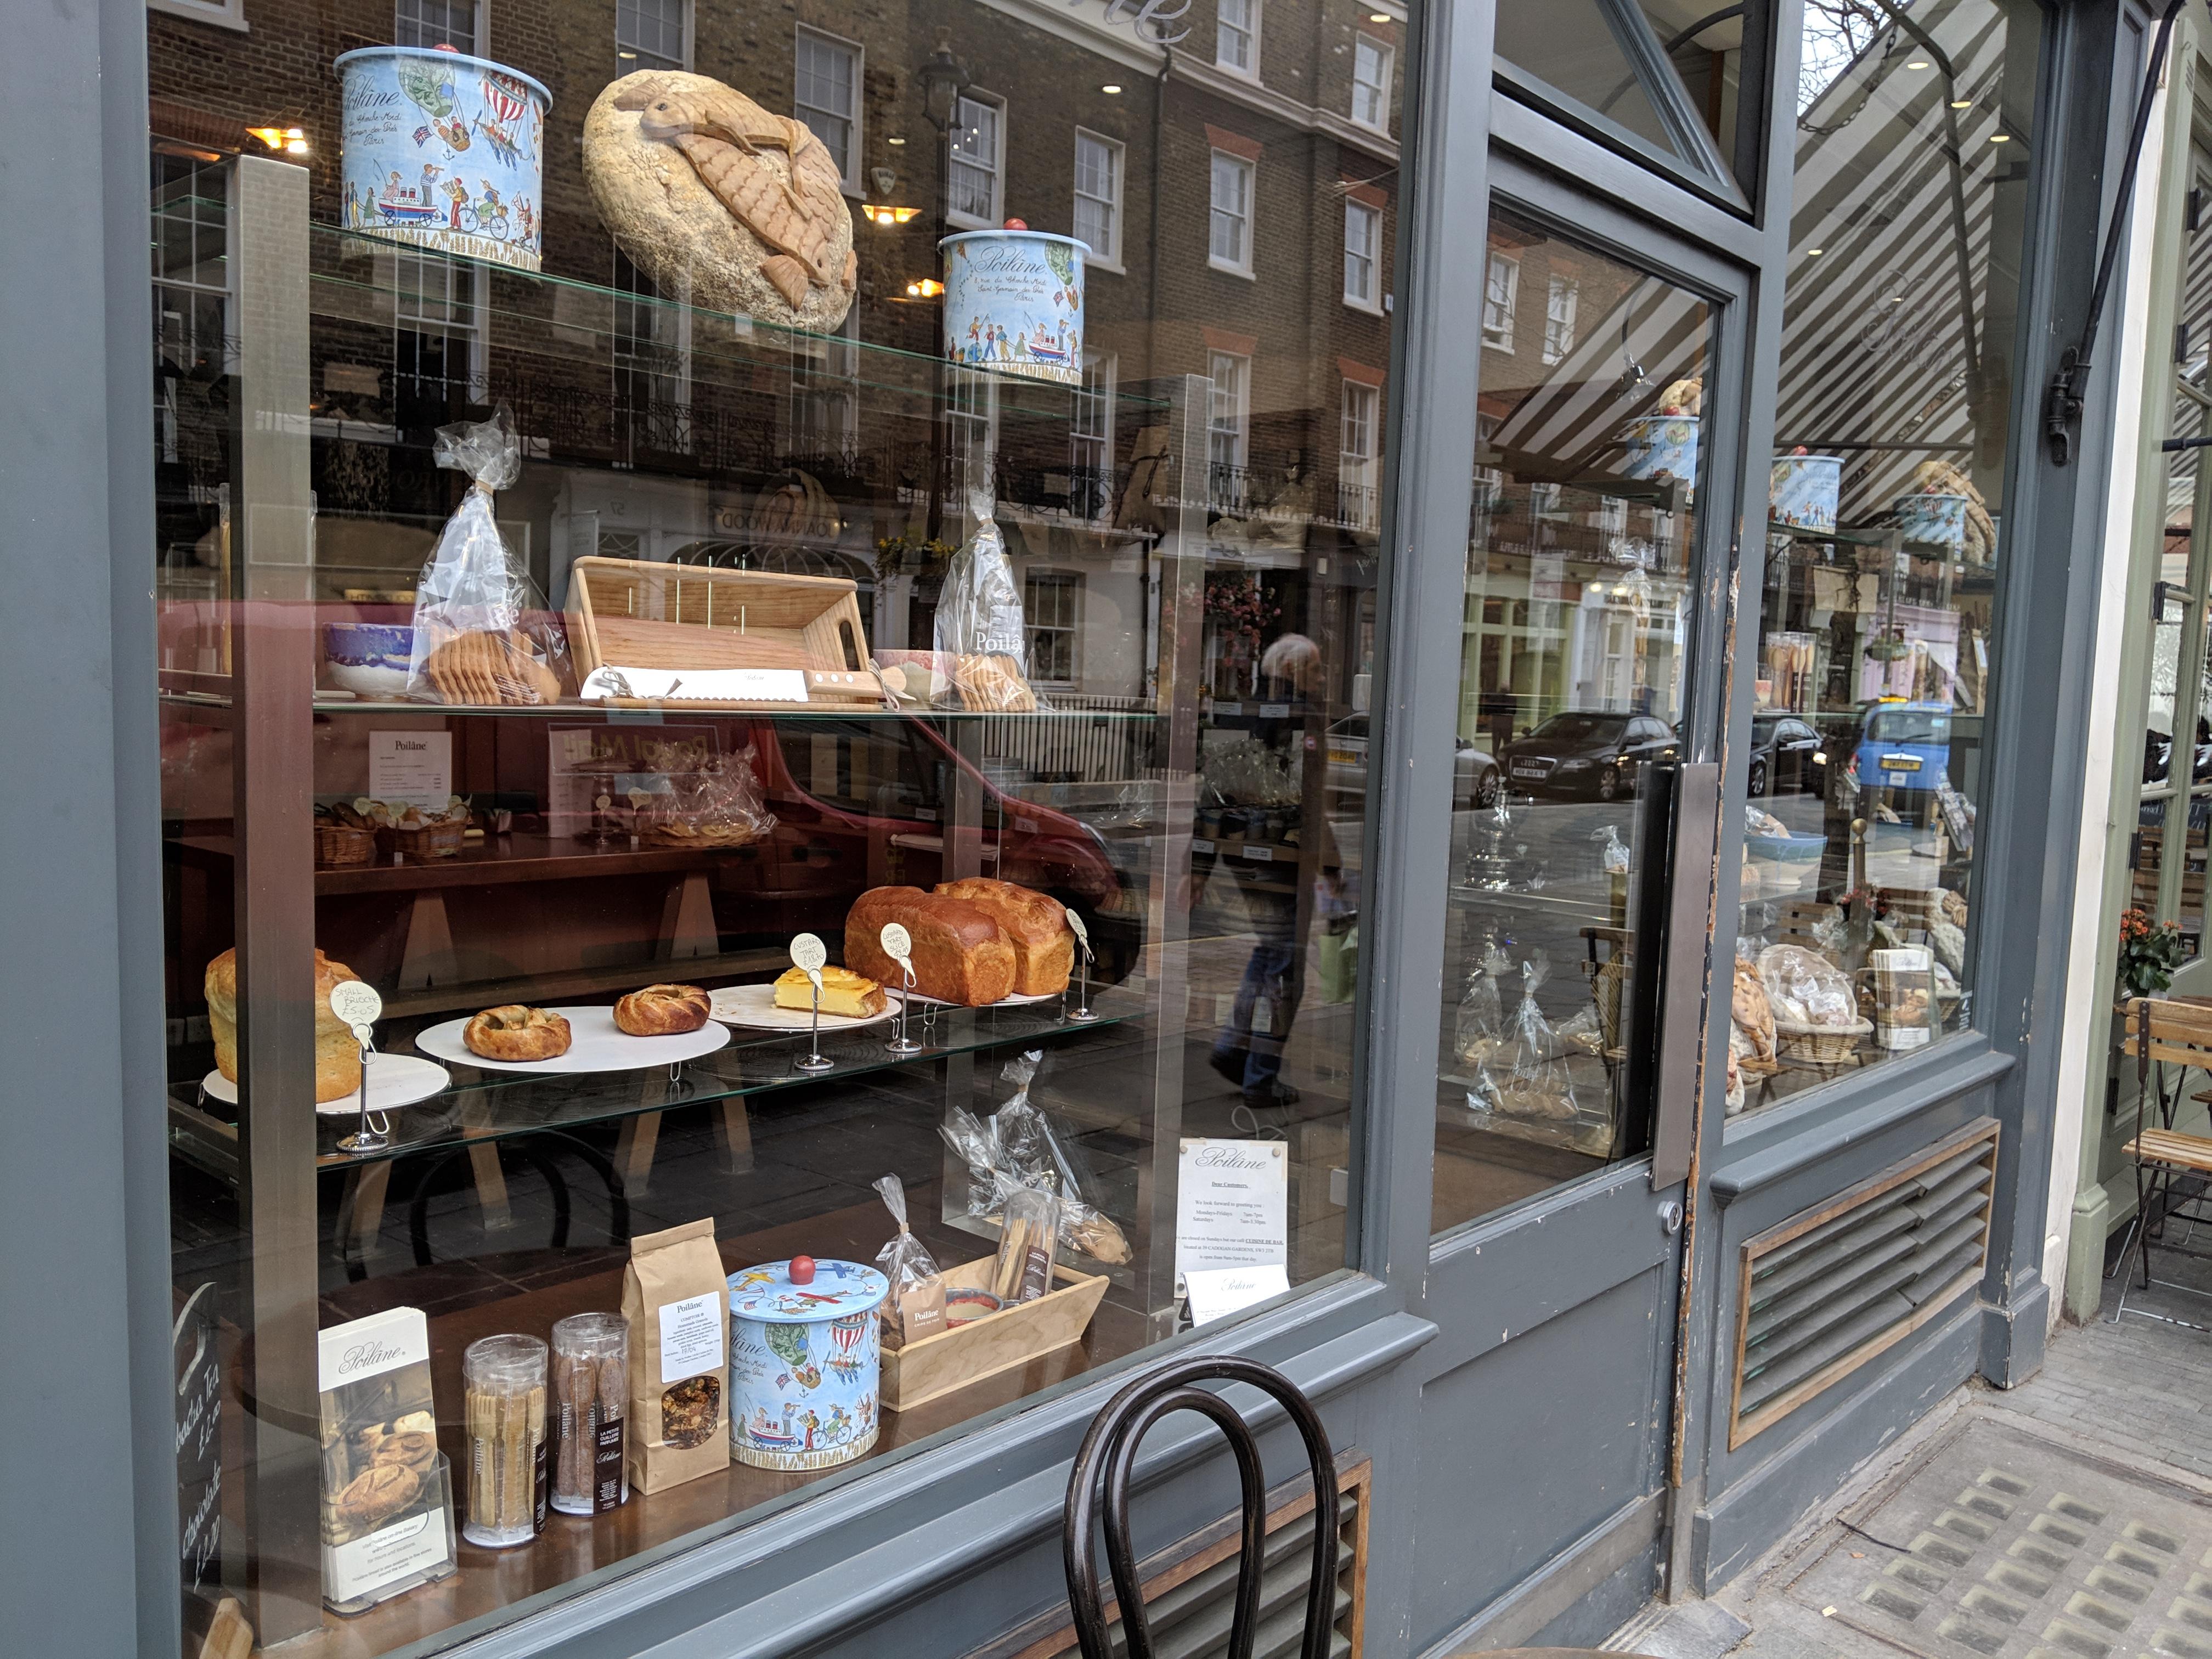 Poilane ポワレーヌ イギリス ロンドン ベーカリー パン屋